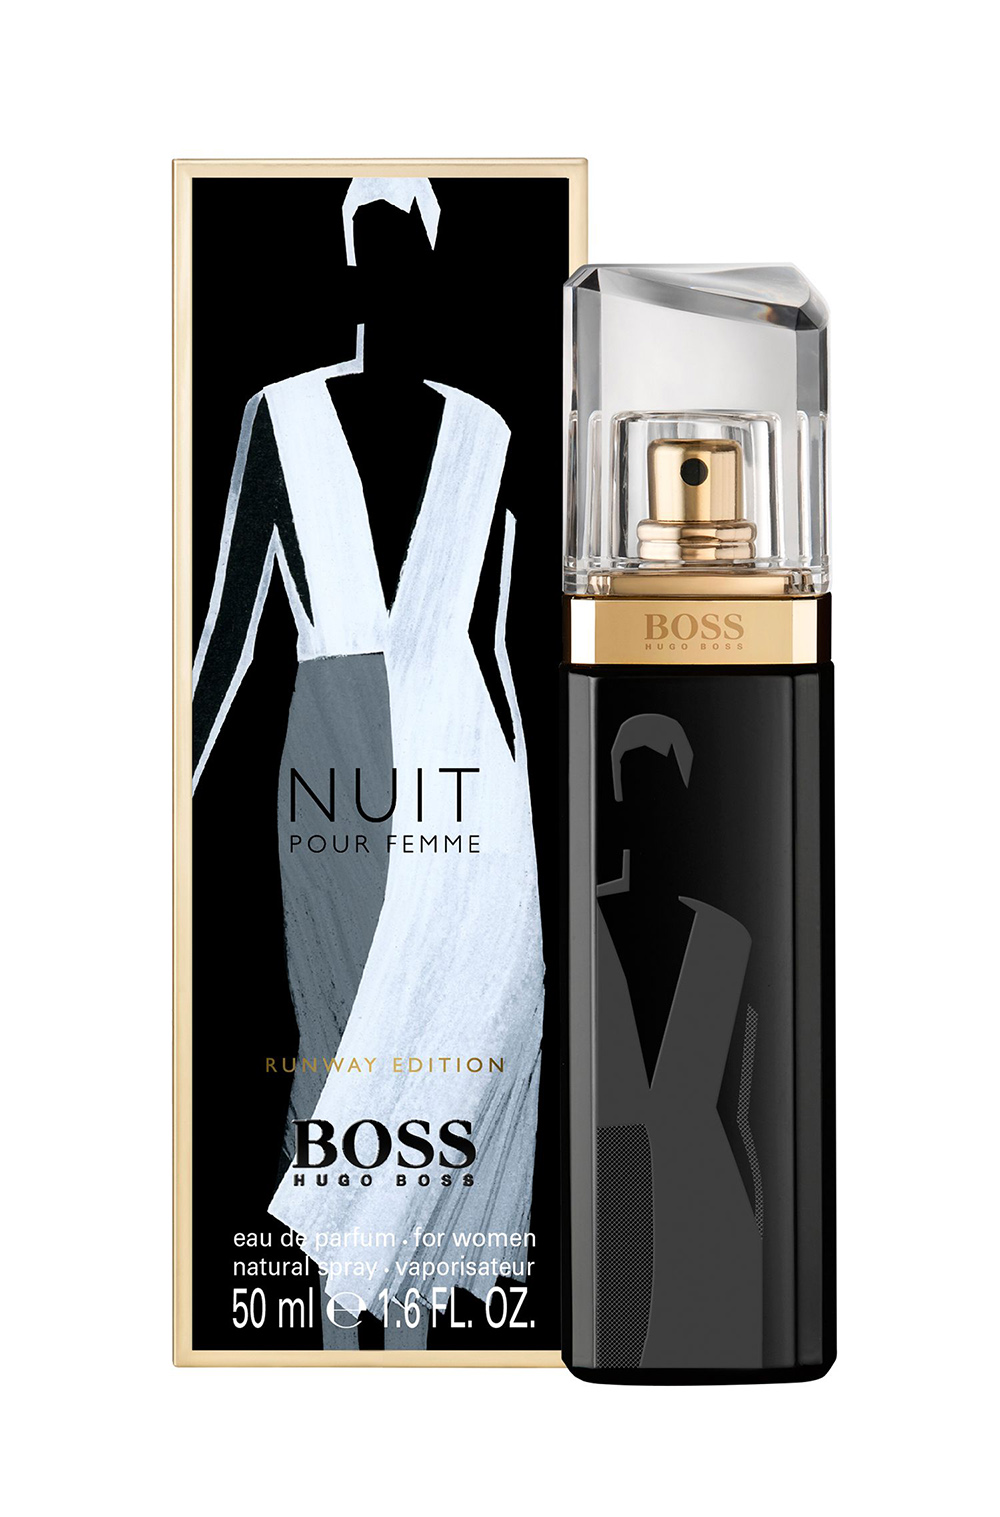 Boss Nuit Pour Femme Runway Edition Hugo Boss аромат аромат для